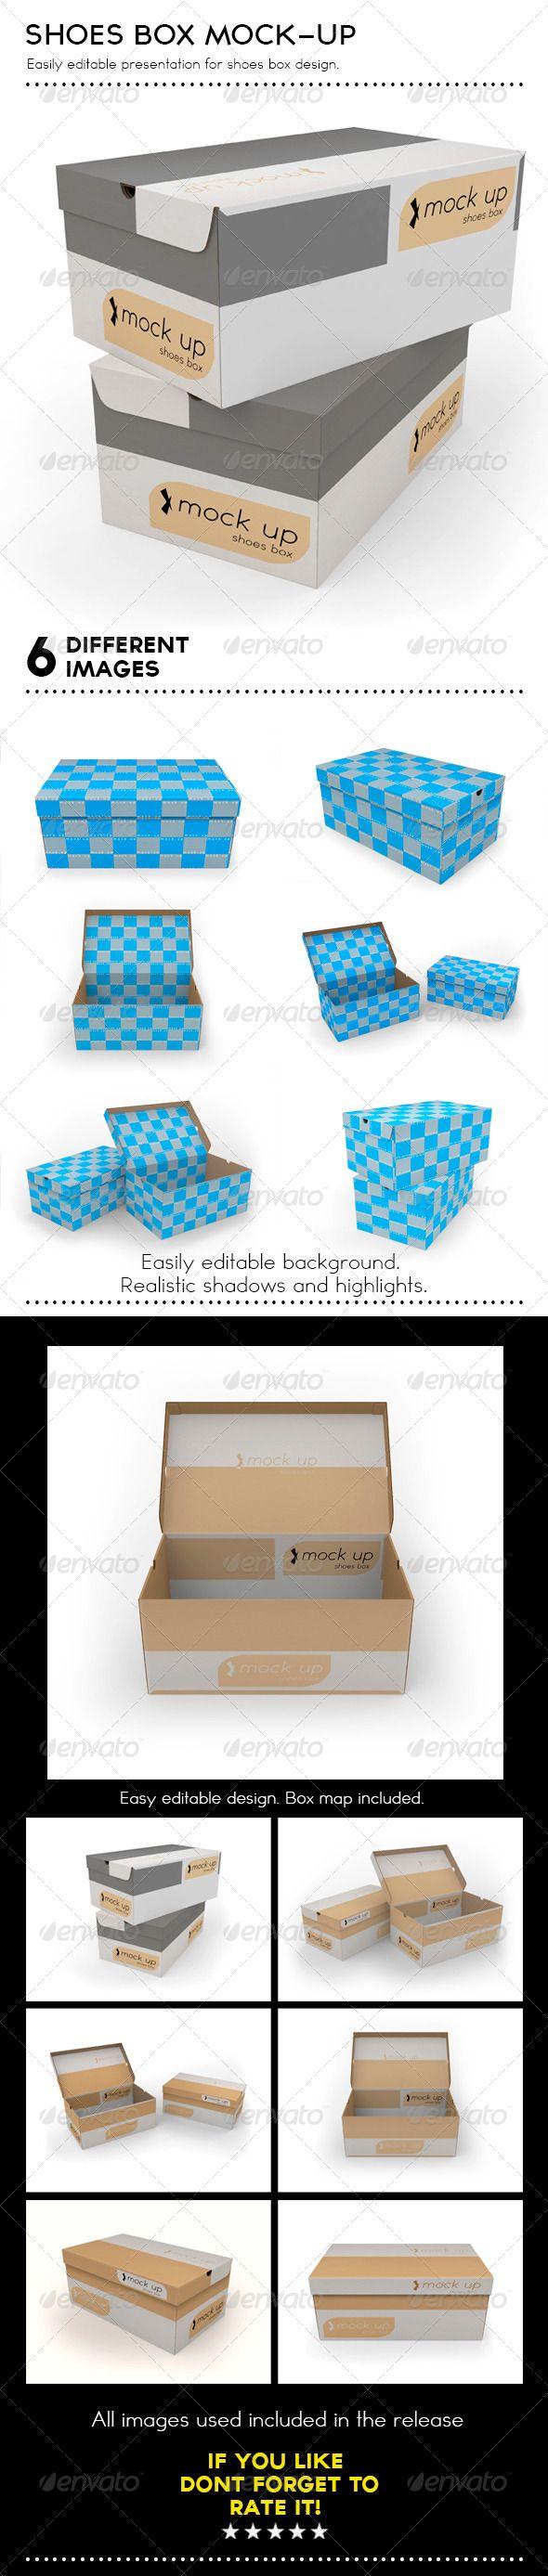 Download Shoes Box Mockup Box Mockup Shoe Box Mockup